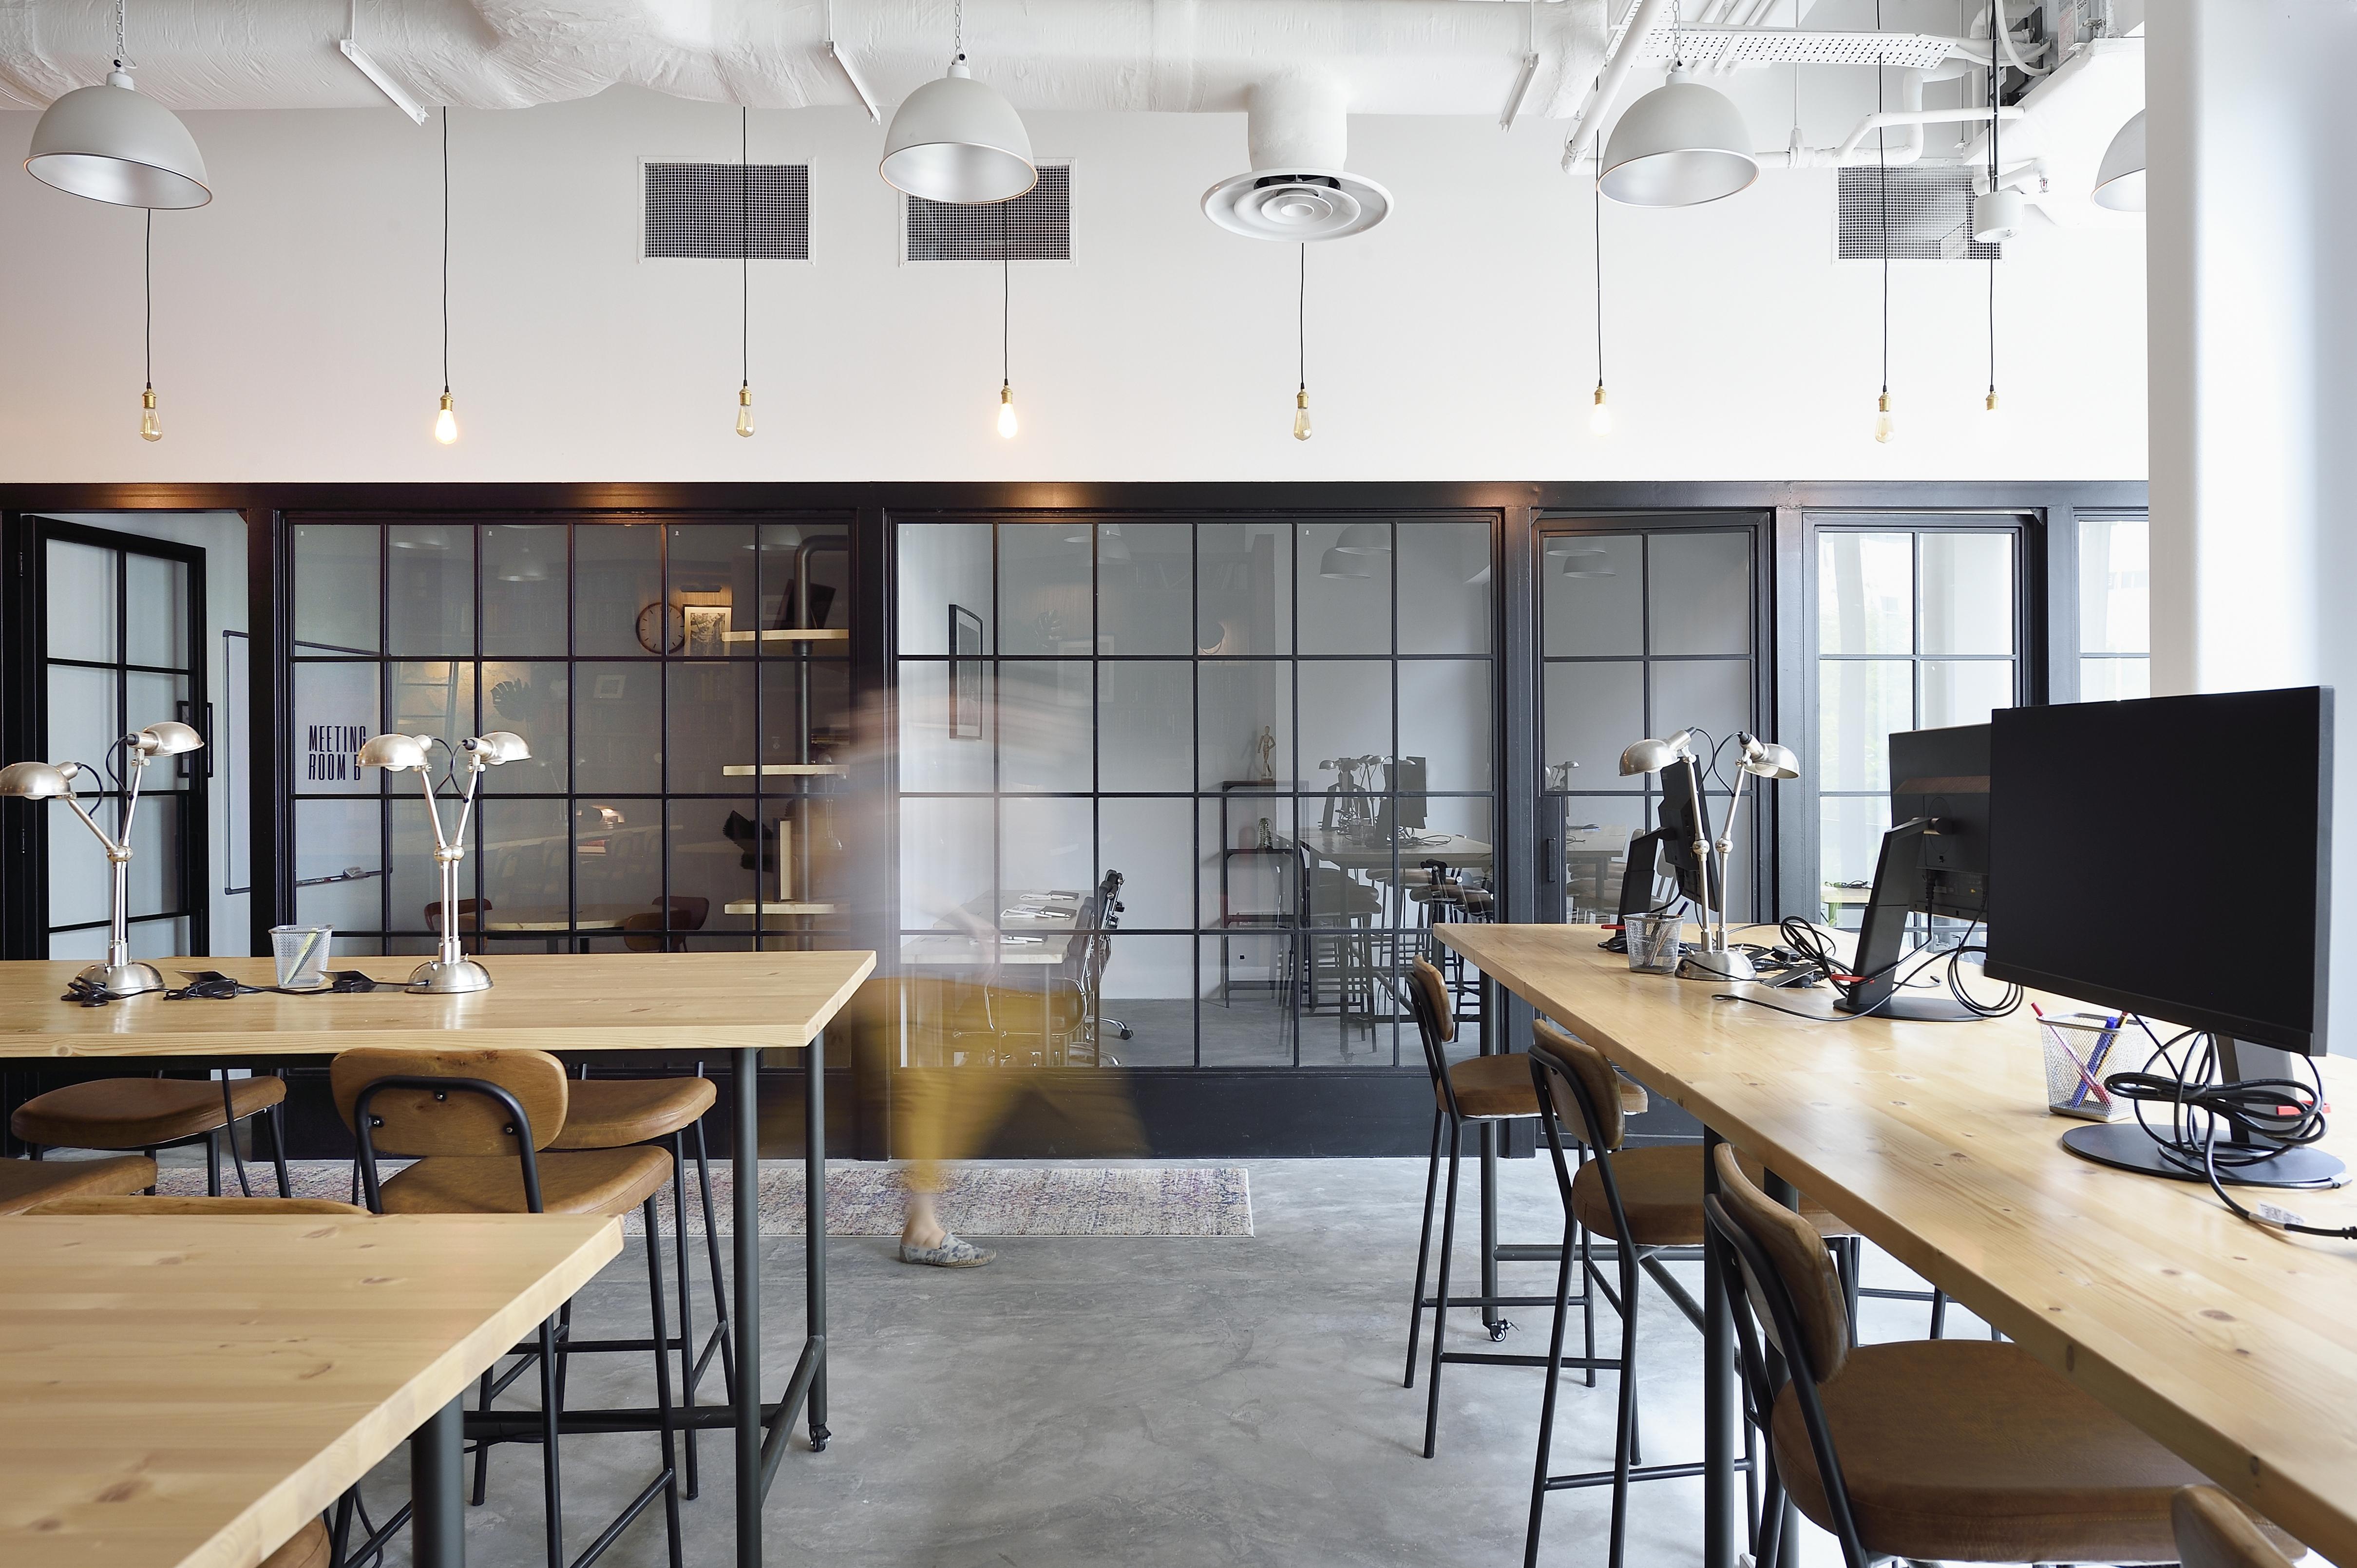 Coworking / flex office , undefined - Coworking Spaces in Nürnberg - 20